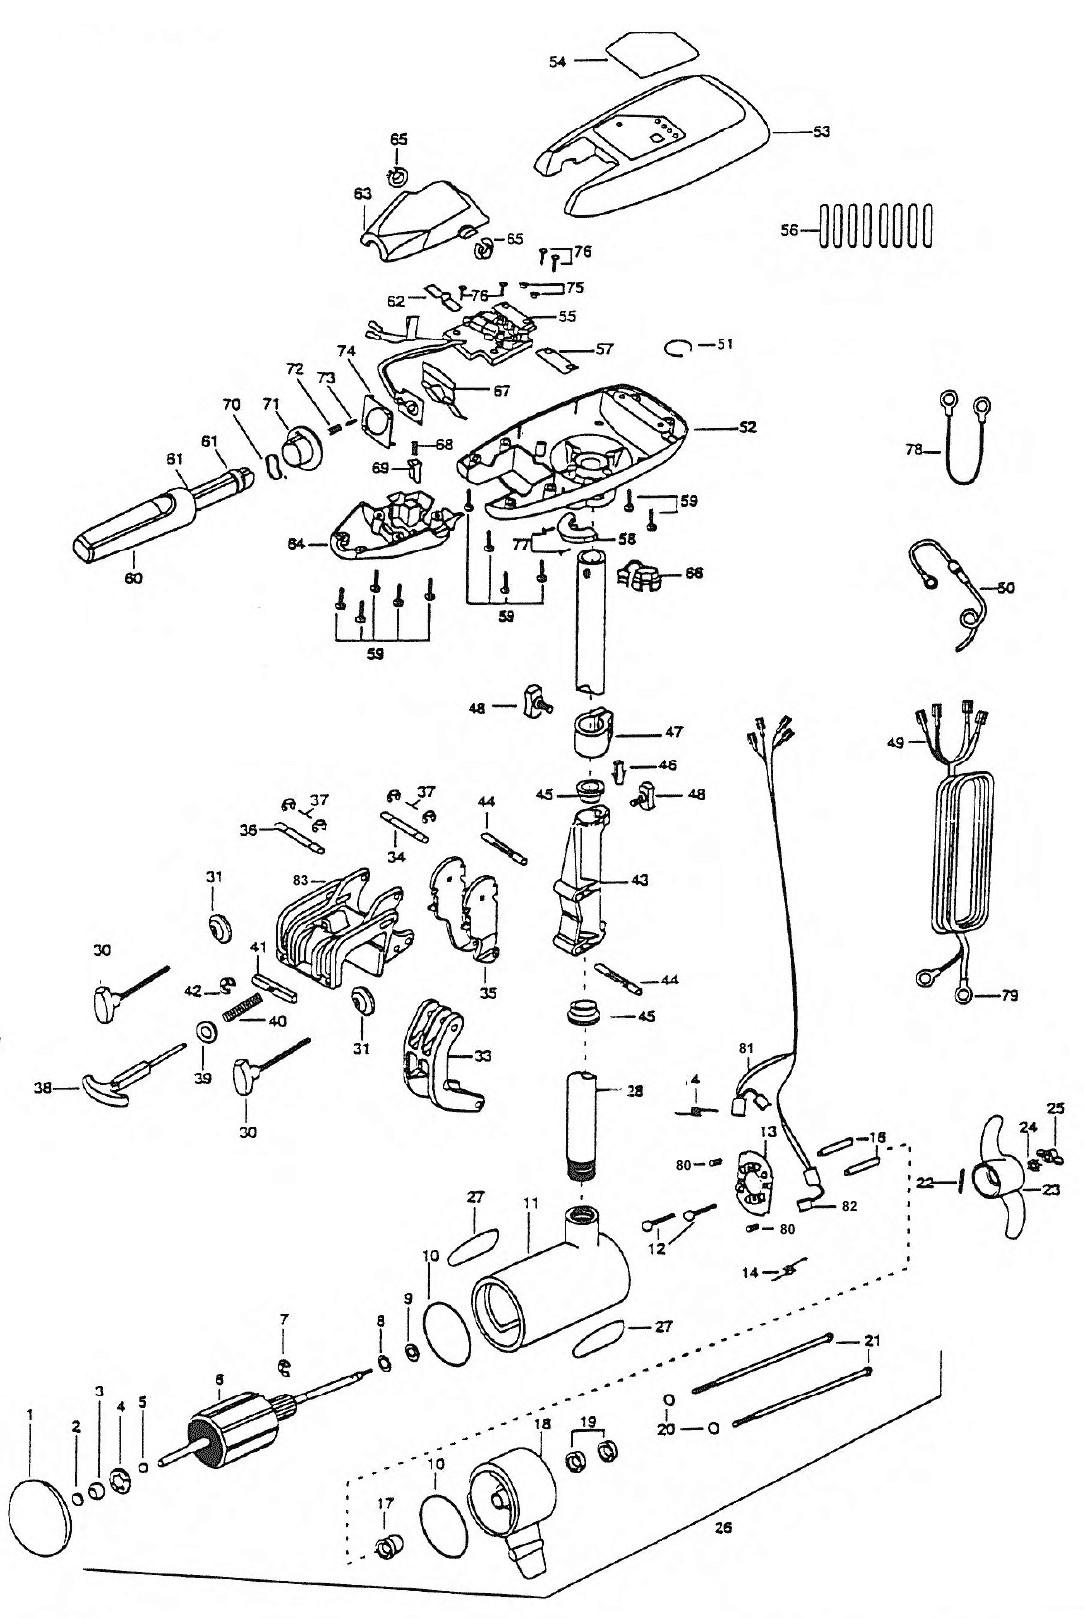 Minn Kota Vantage Trolling Motor Diagram Electrical Wiring Diagrams Electric 65 Work U2022 Riptide 45 S Saltwater Transom Mount